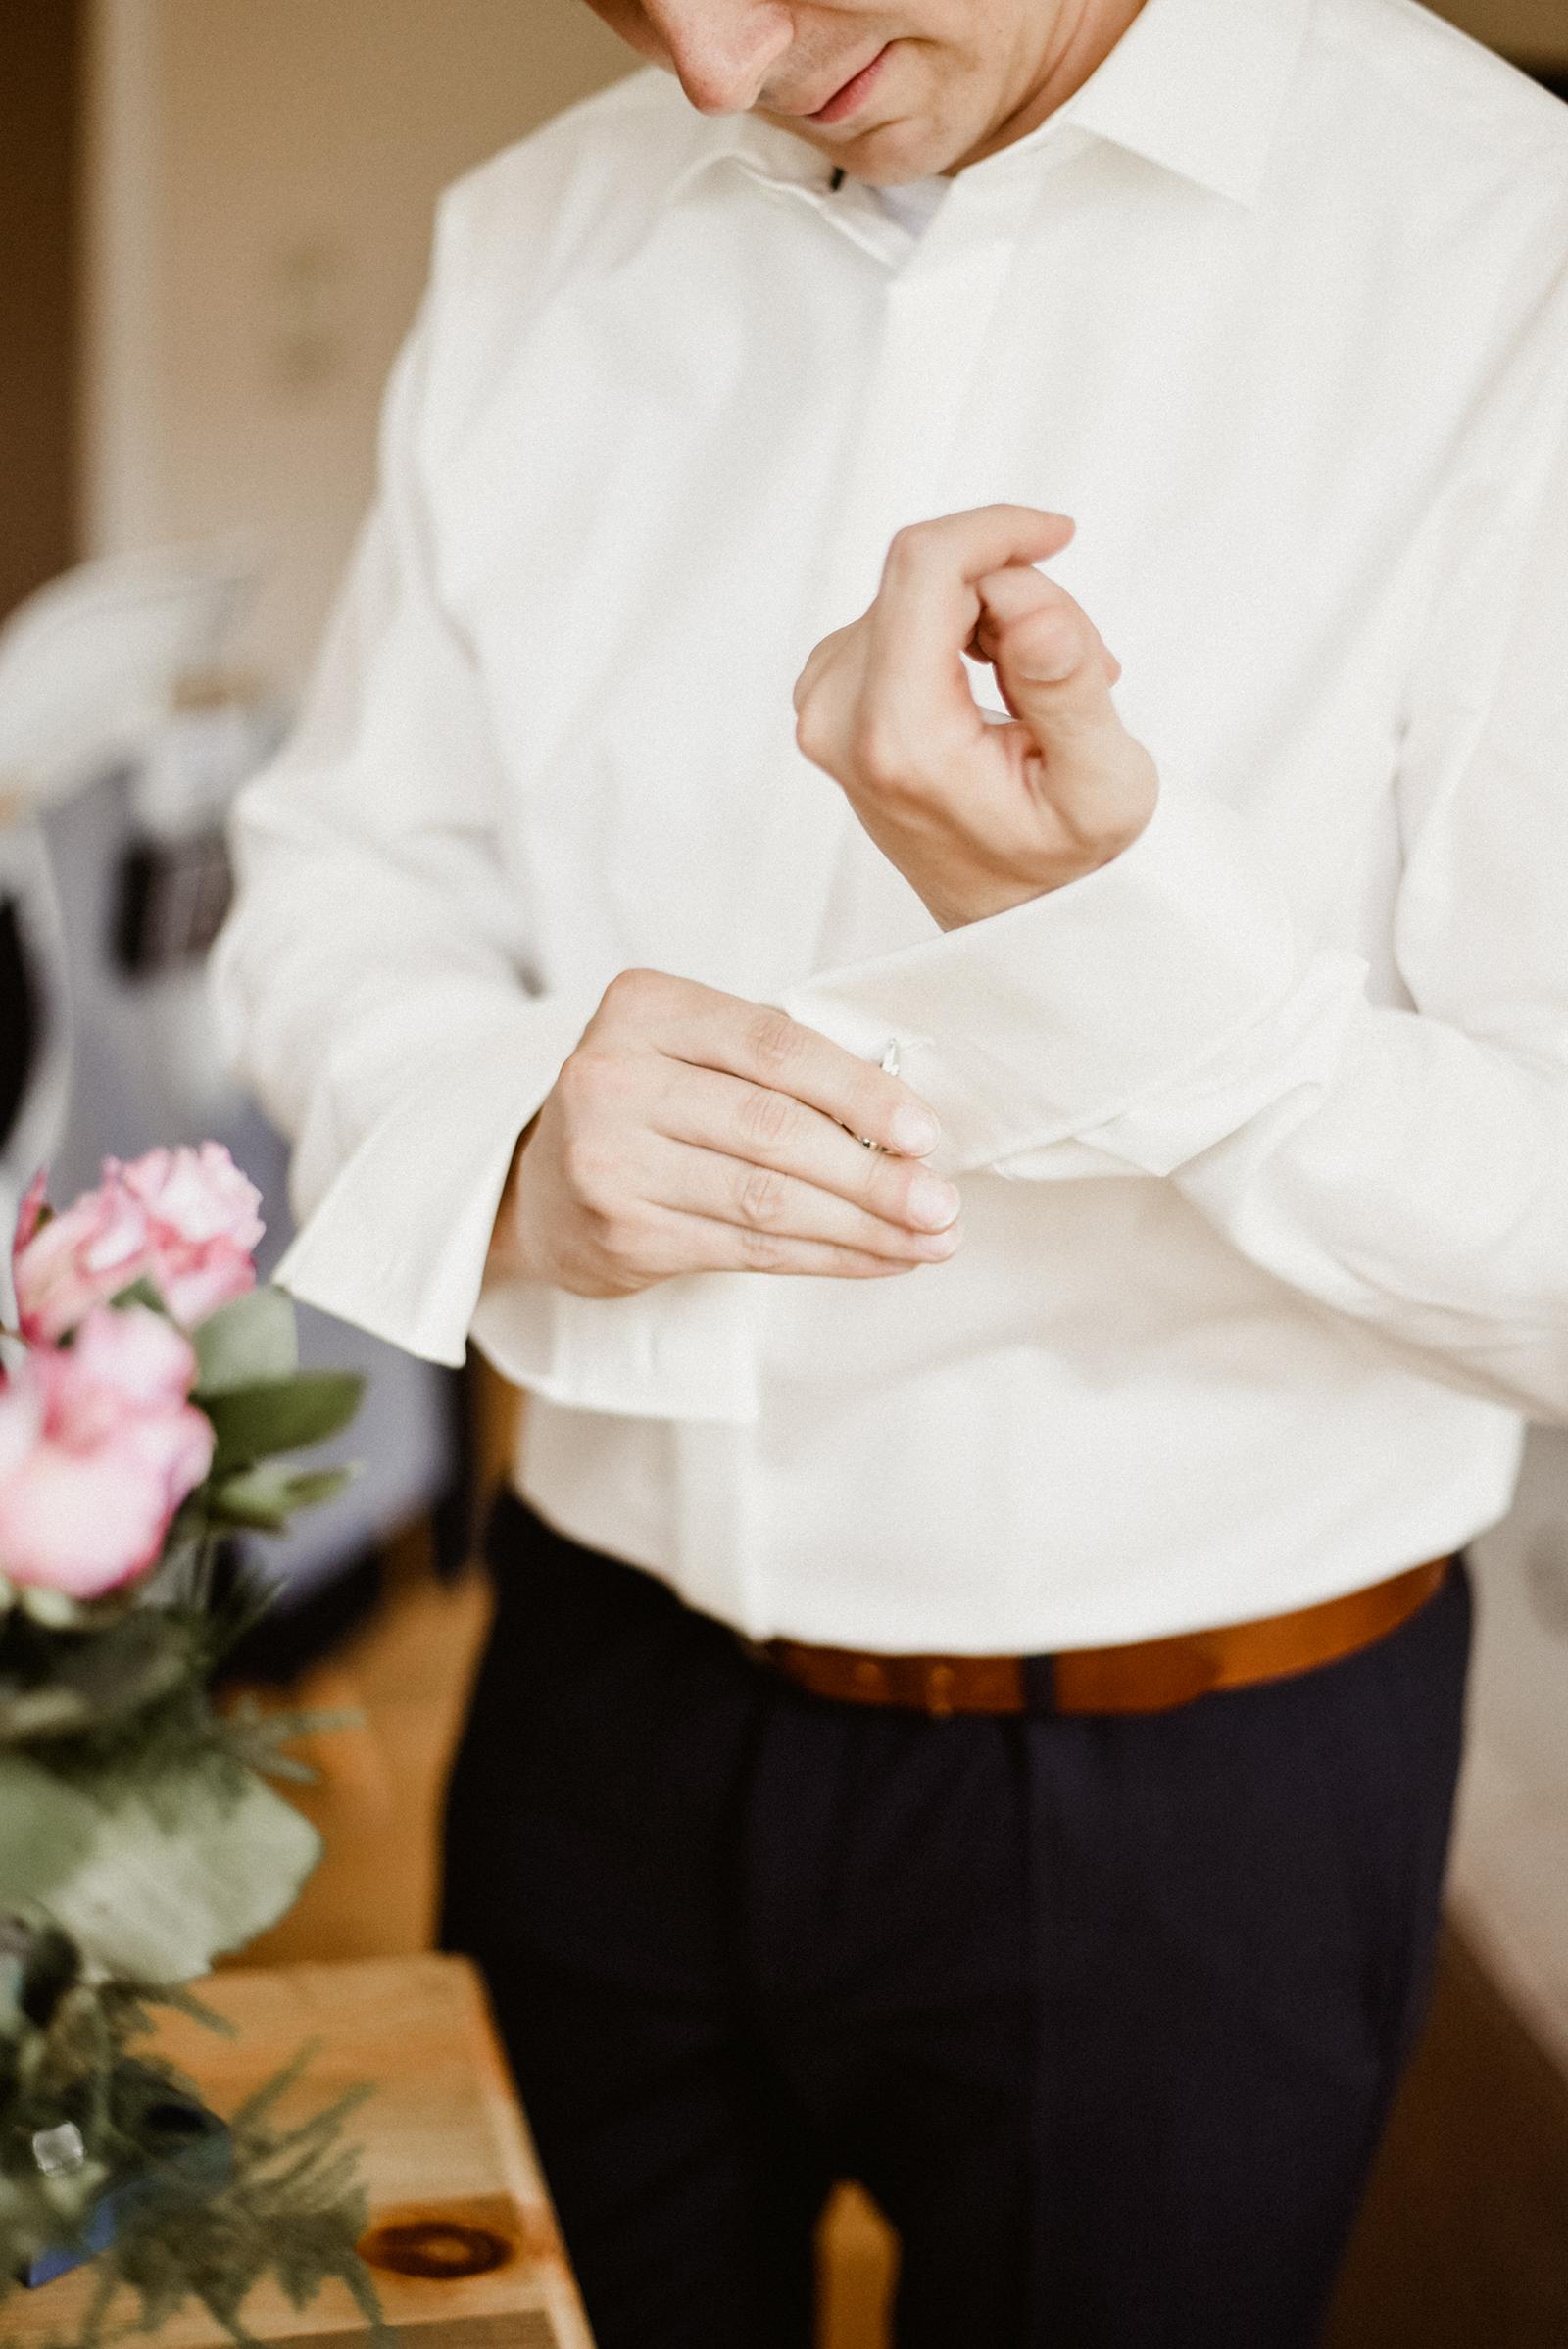 Das Getting Ready vom Bräutigam